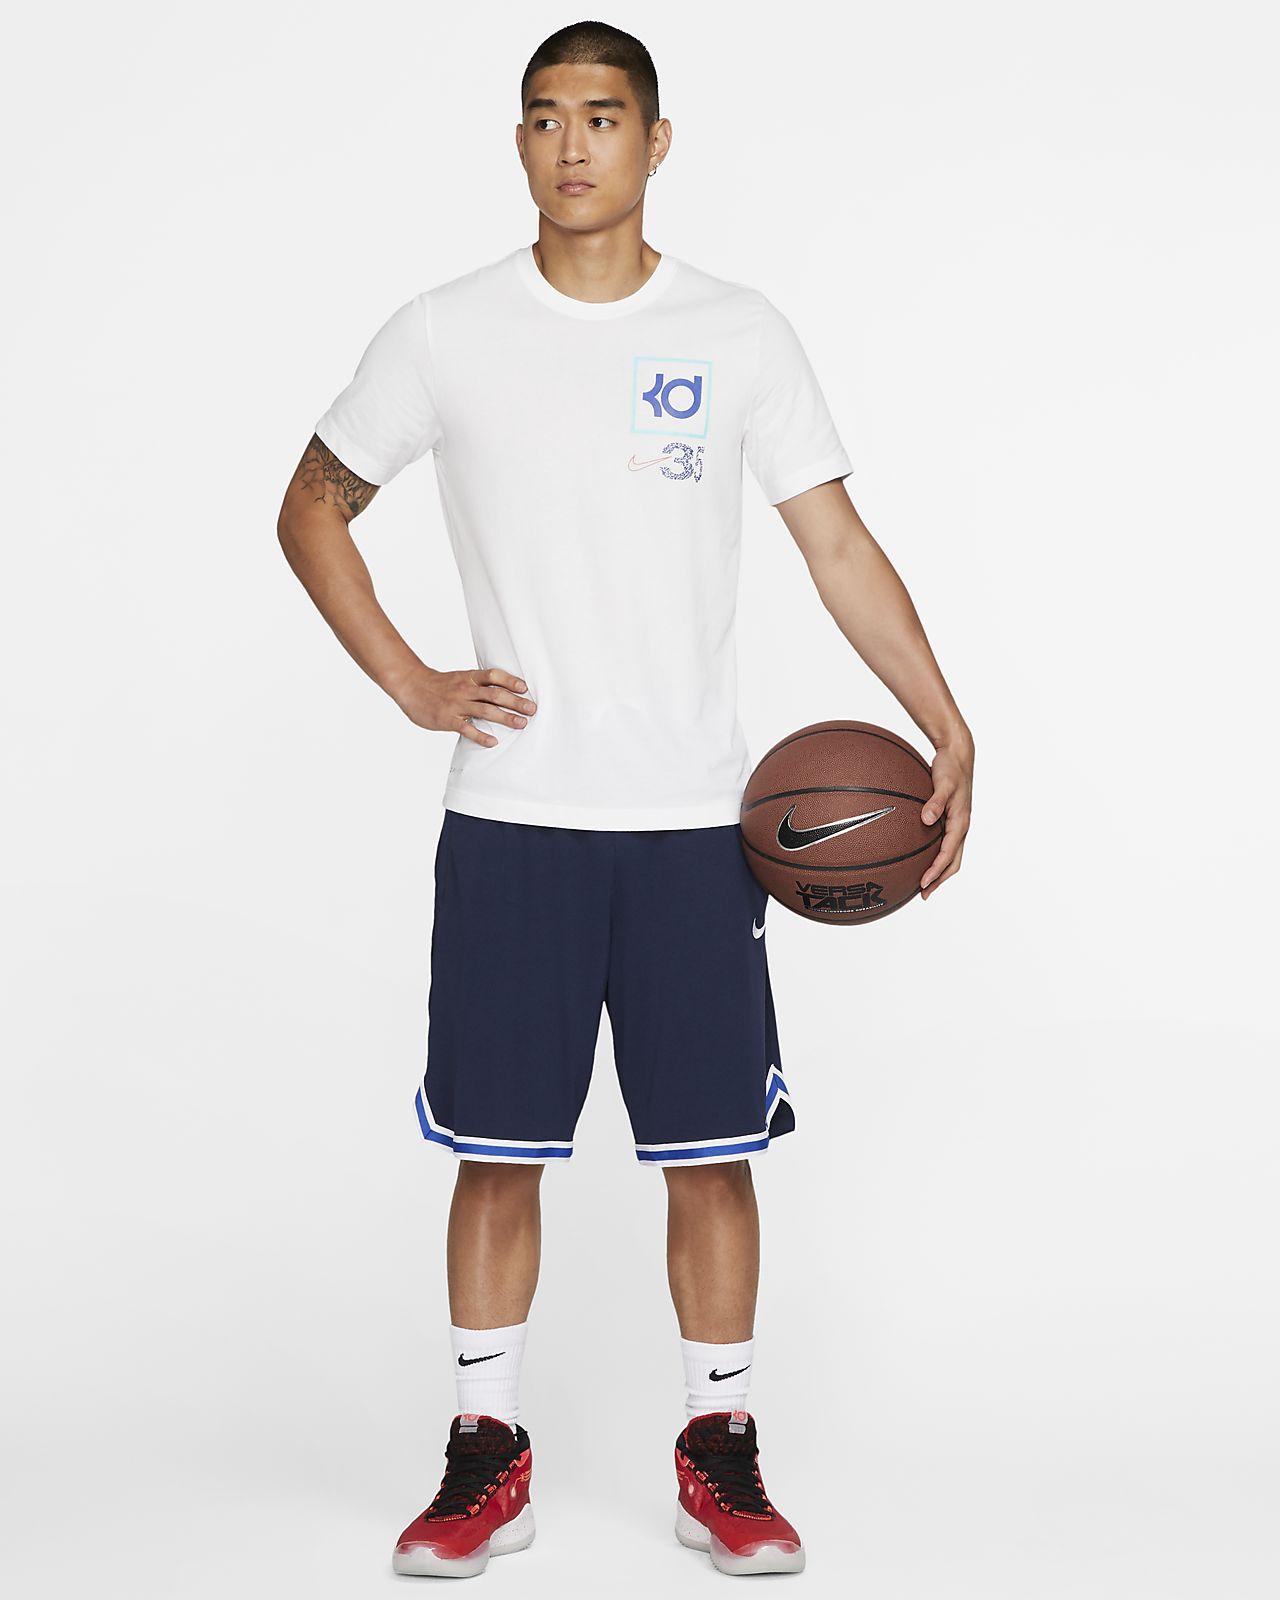 Nike Dri FIT KD Logo Basketball T Shirt